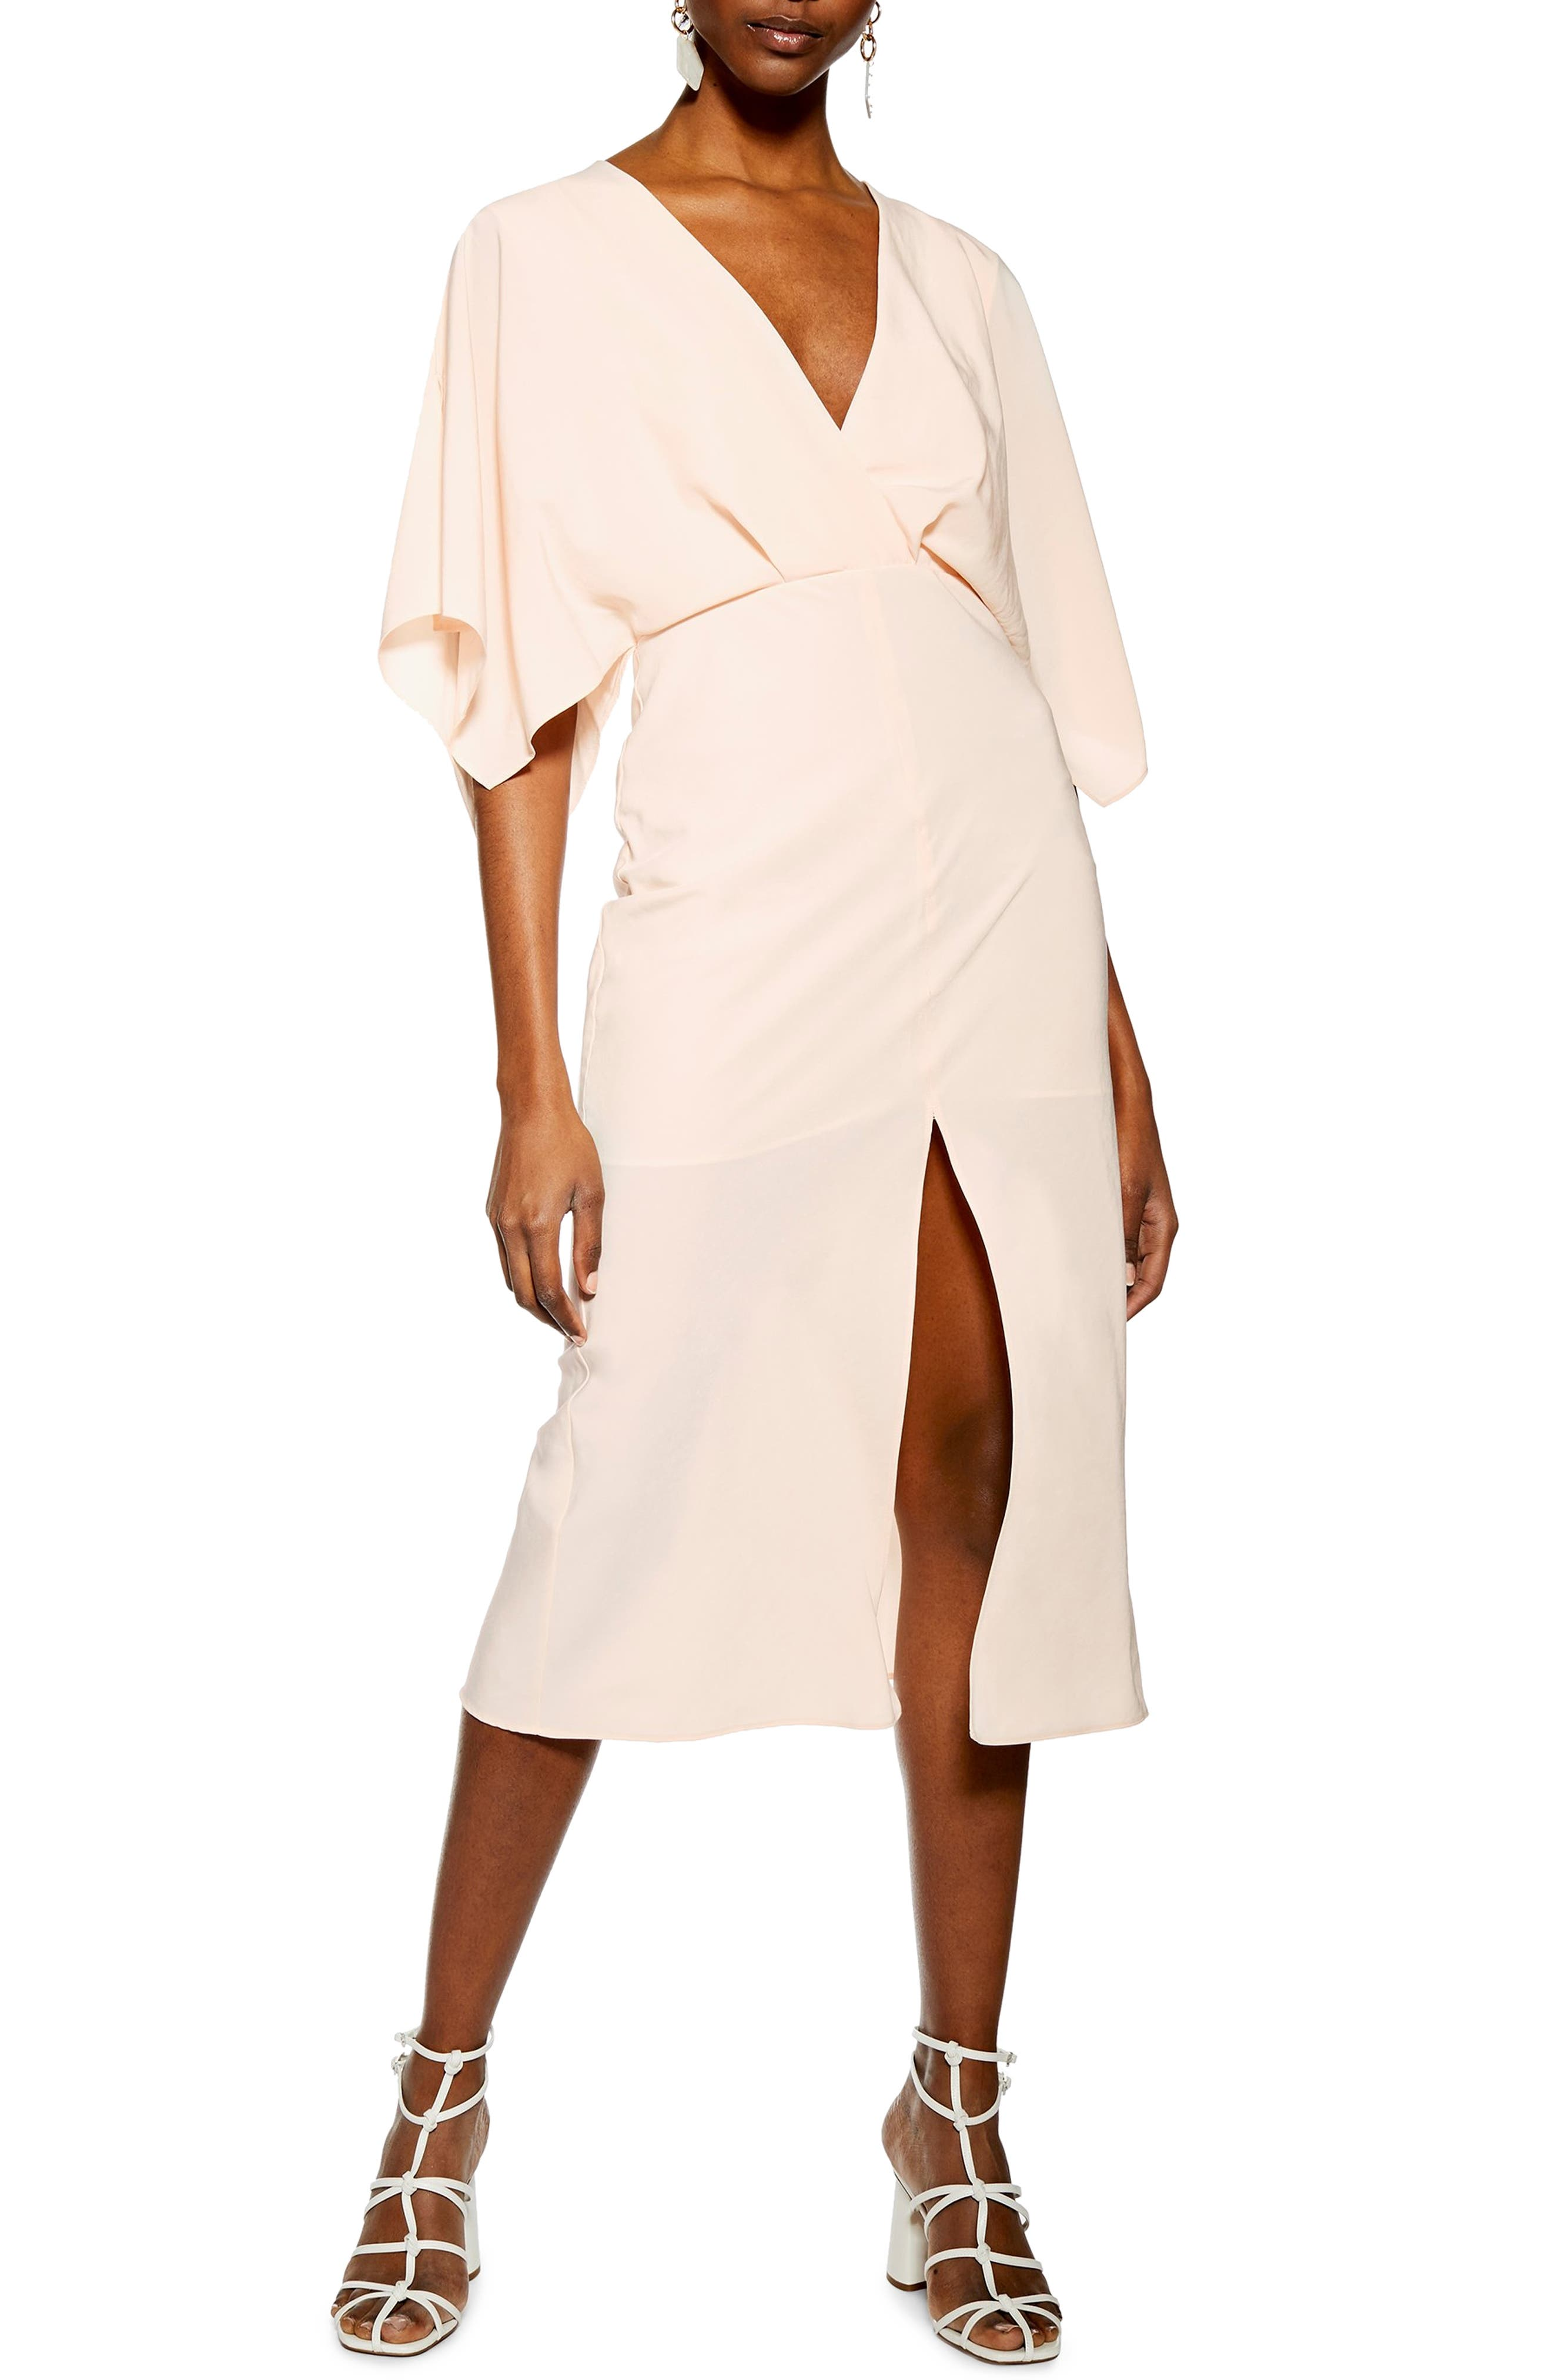 Topshop Batwing Plunge Tea Length Dress, US (fits like 2-4) - Pink